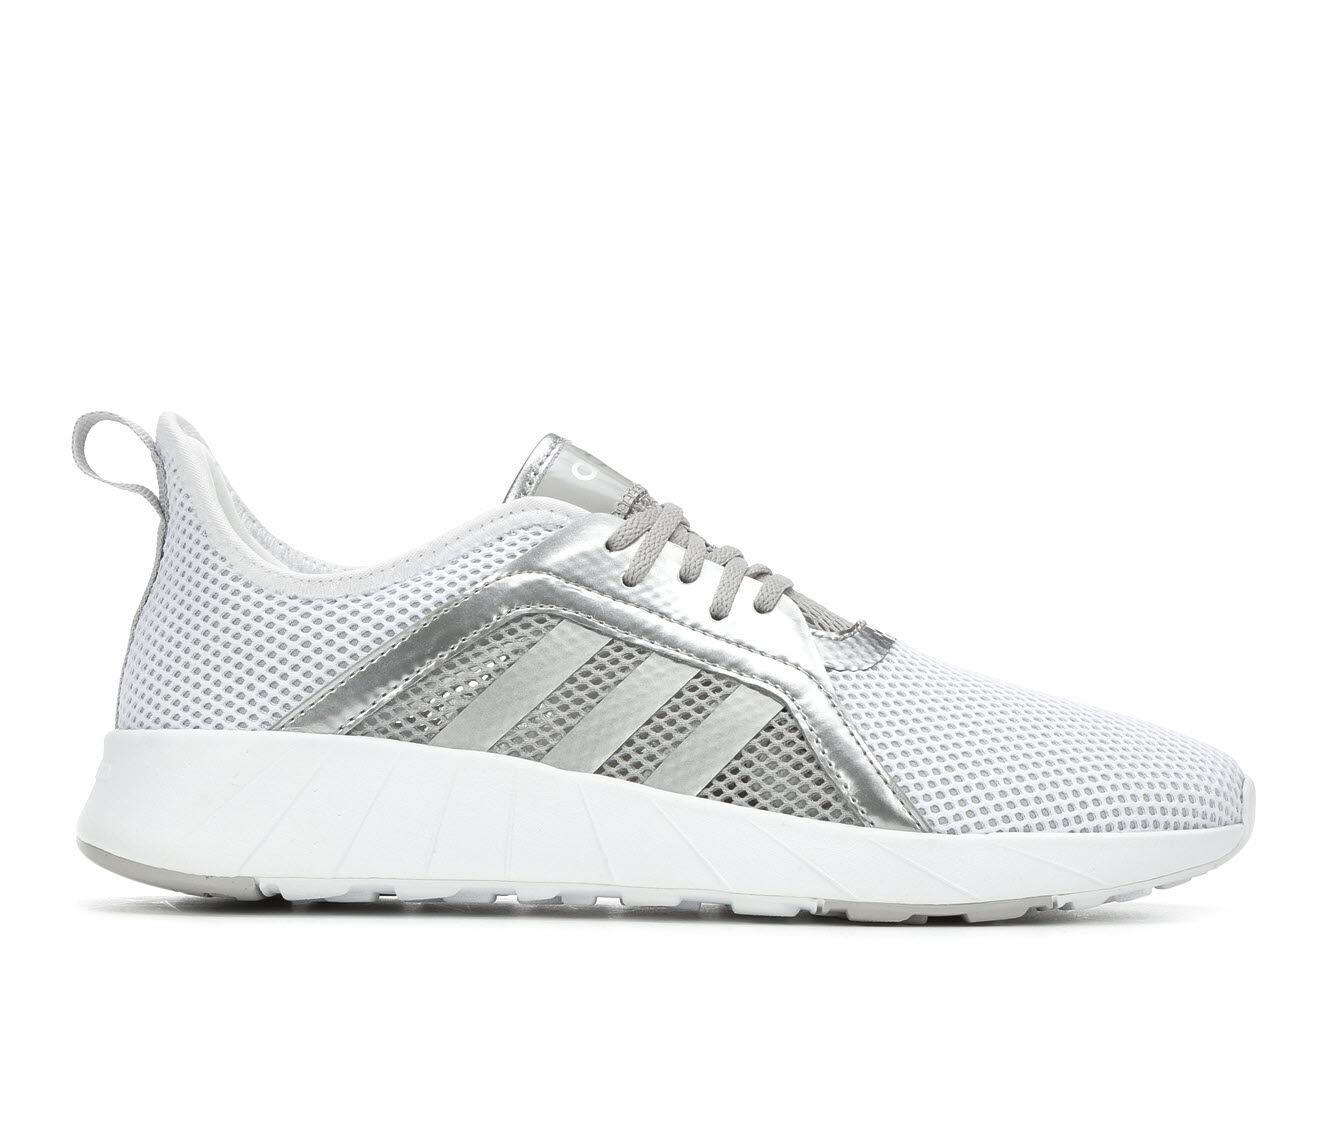 Women's Adidas Khoe Run Running Shoes White/Grey/Silv